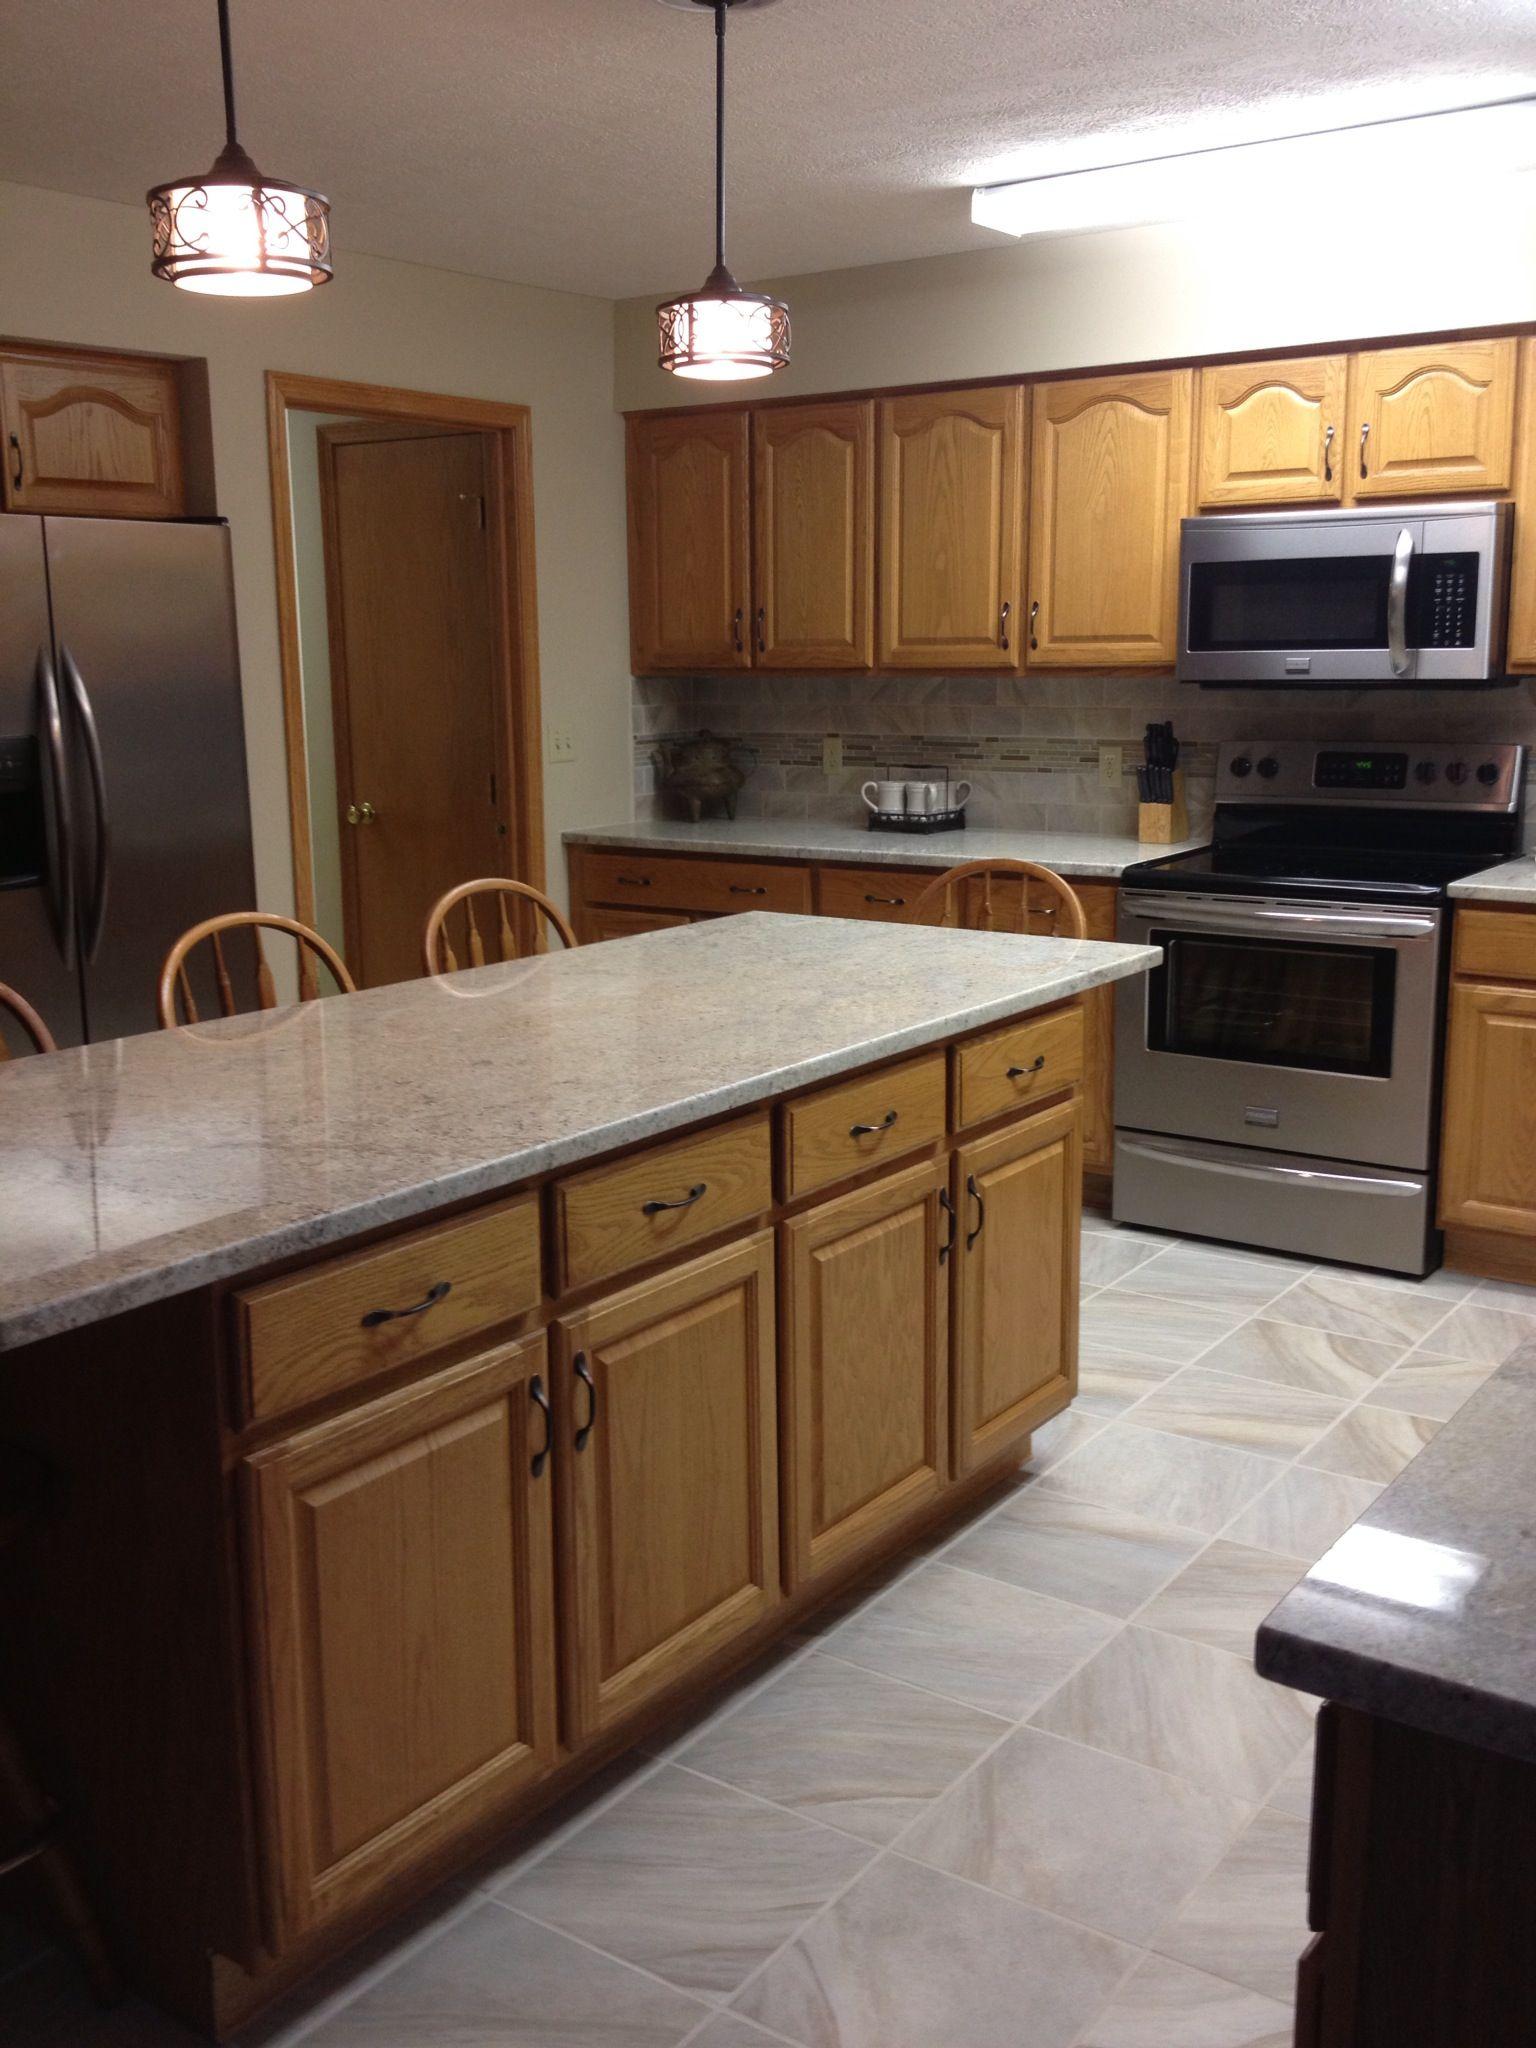 Granite Countertop Bianco Romano! We love it! Kitchen